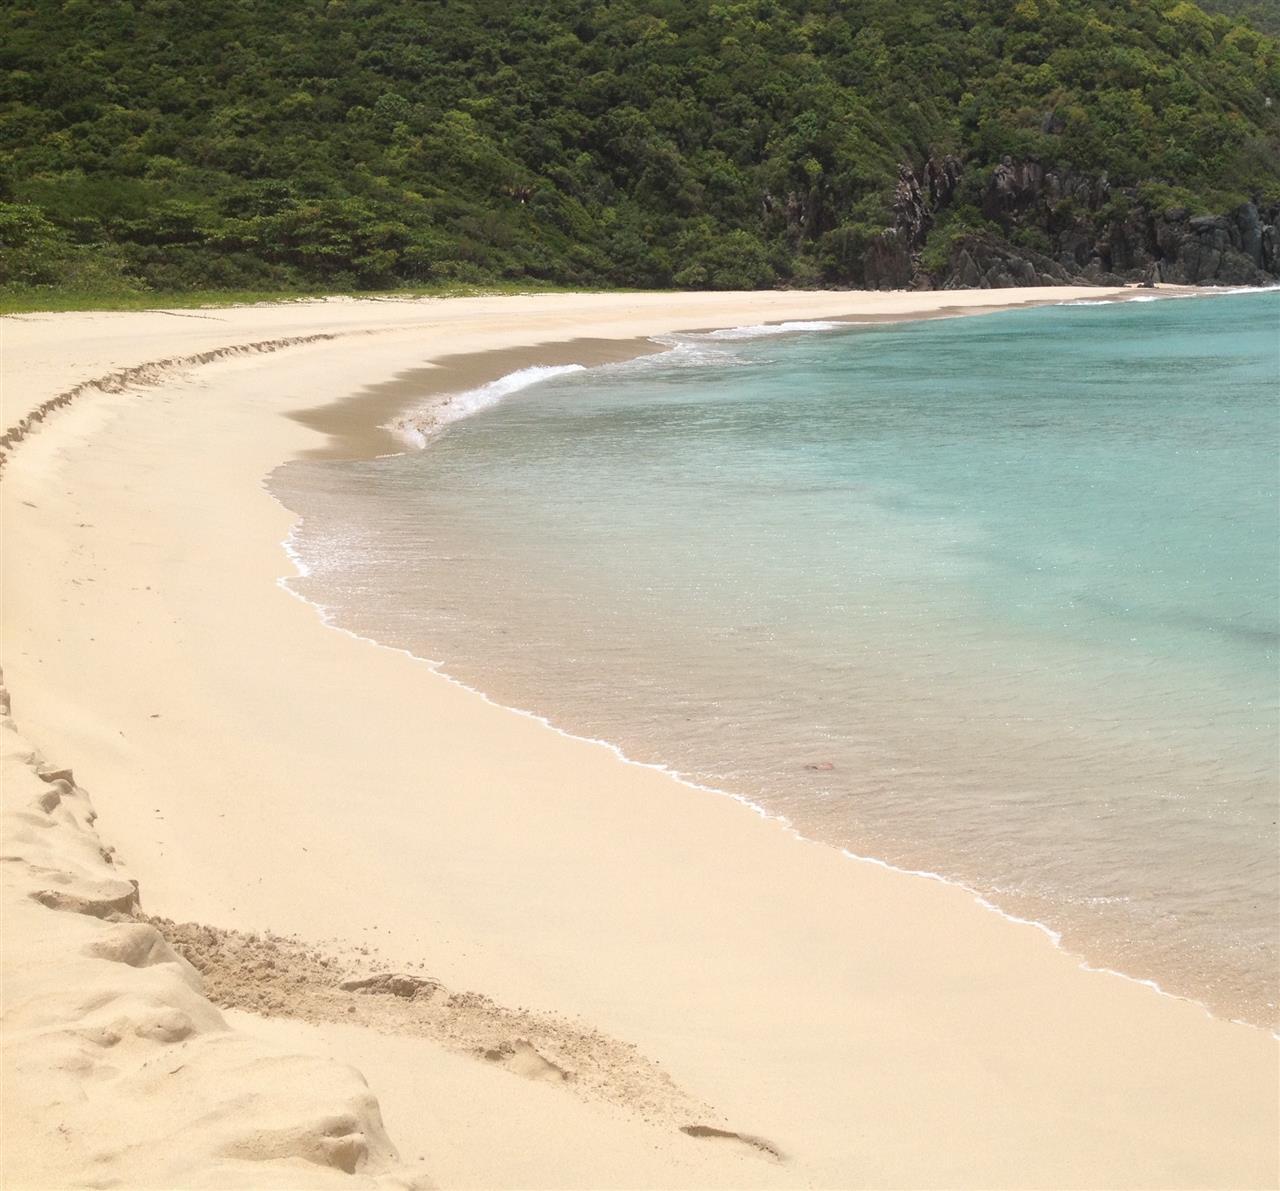 Rogues Bay, Tortola Courtesy of Smiths Gore BVI Ltd.